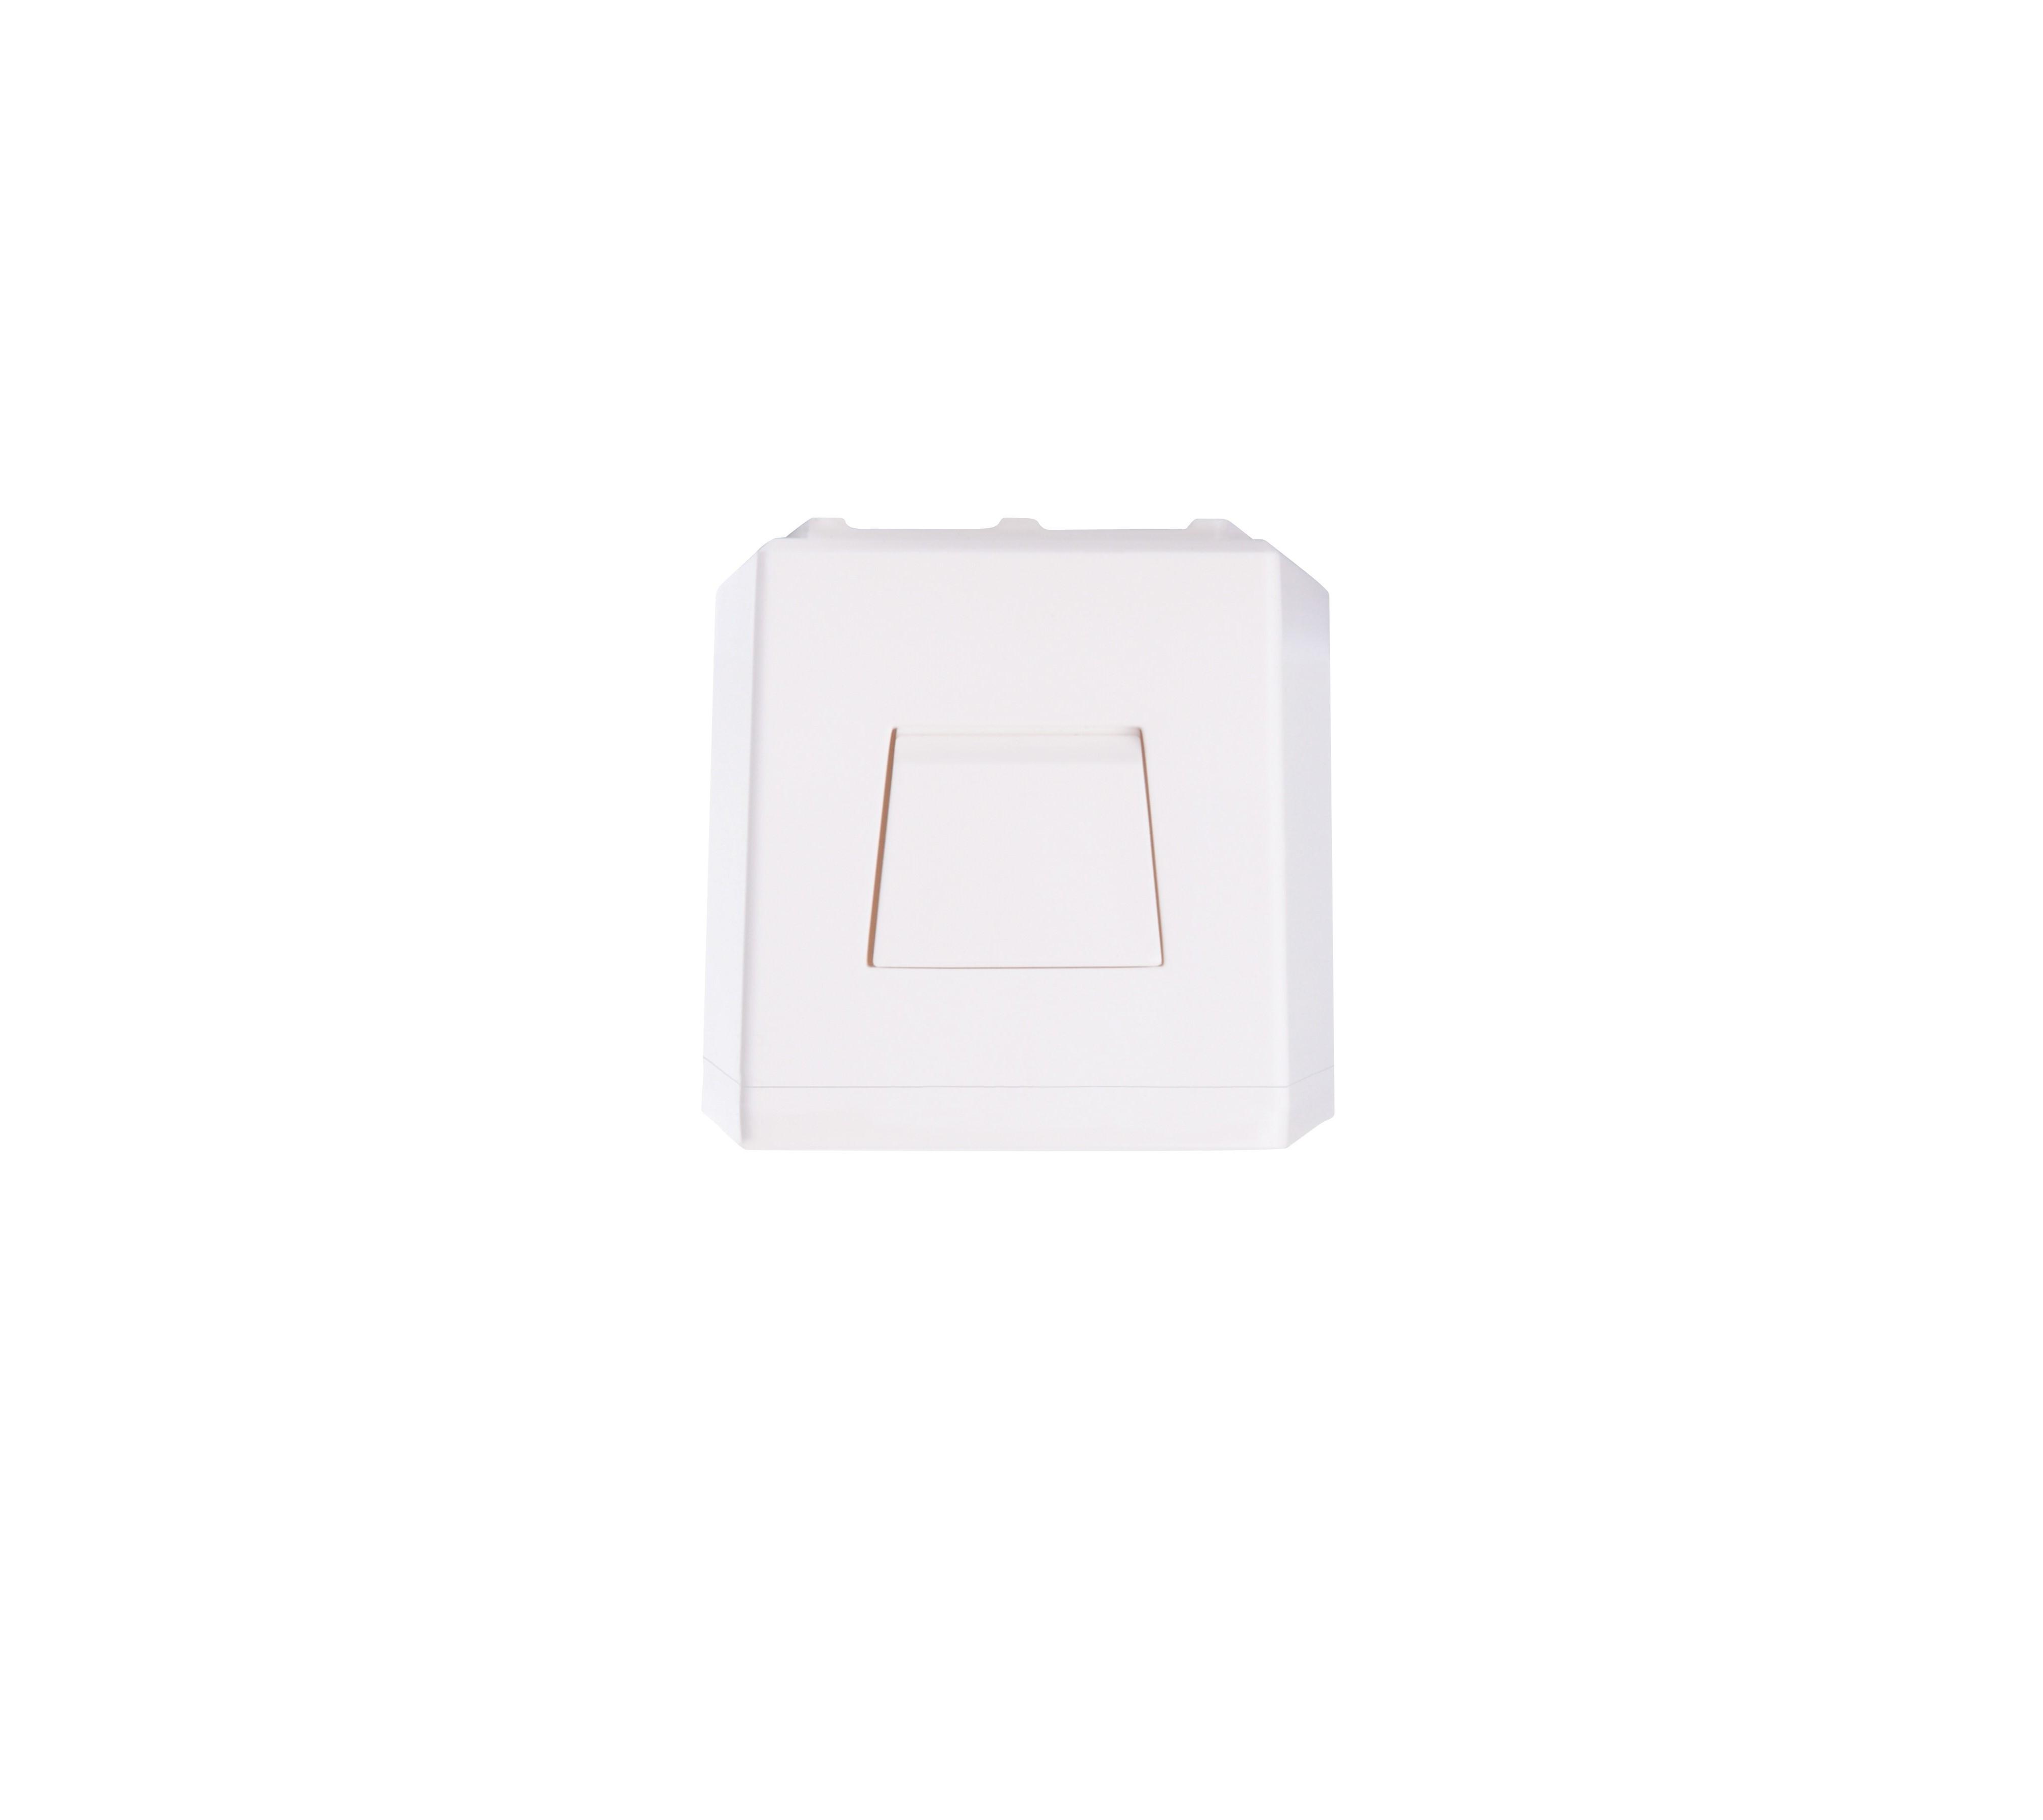 Lampa antipanica led Intelight 94658   3h mentinut test automat 1